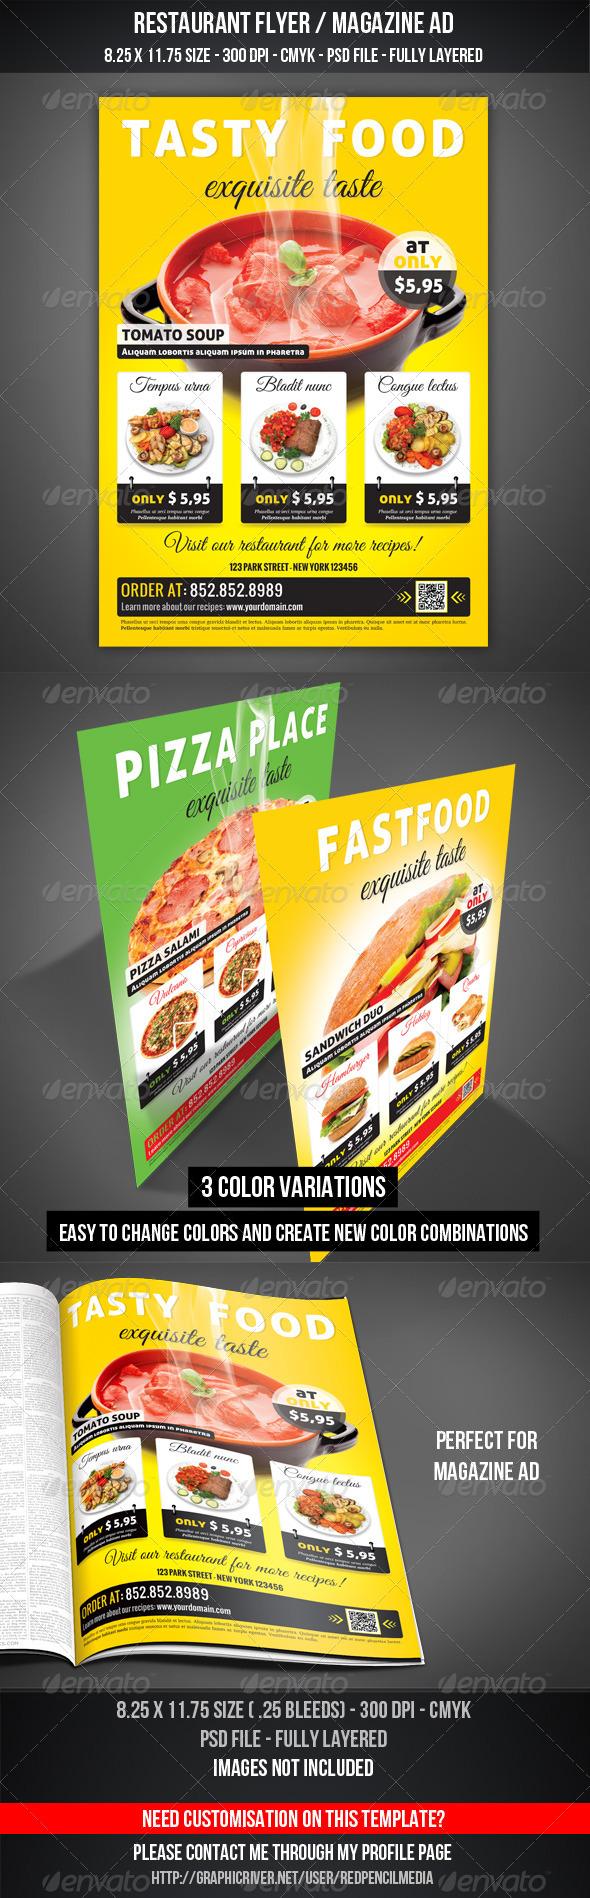 Restaurant Flyer / Magazine AD - Restaurant Flyers